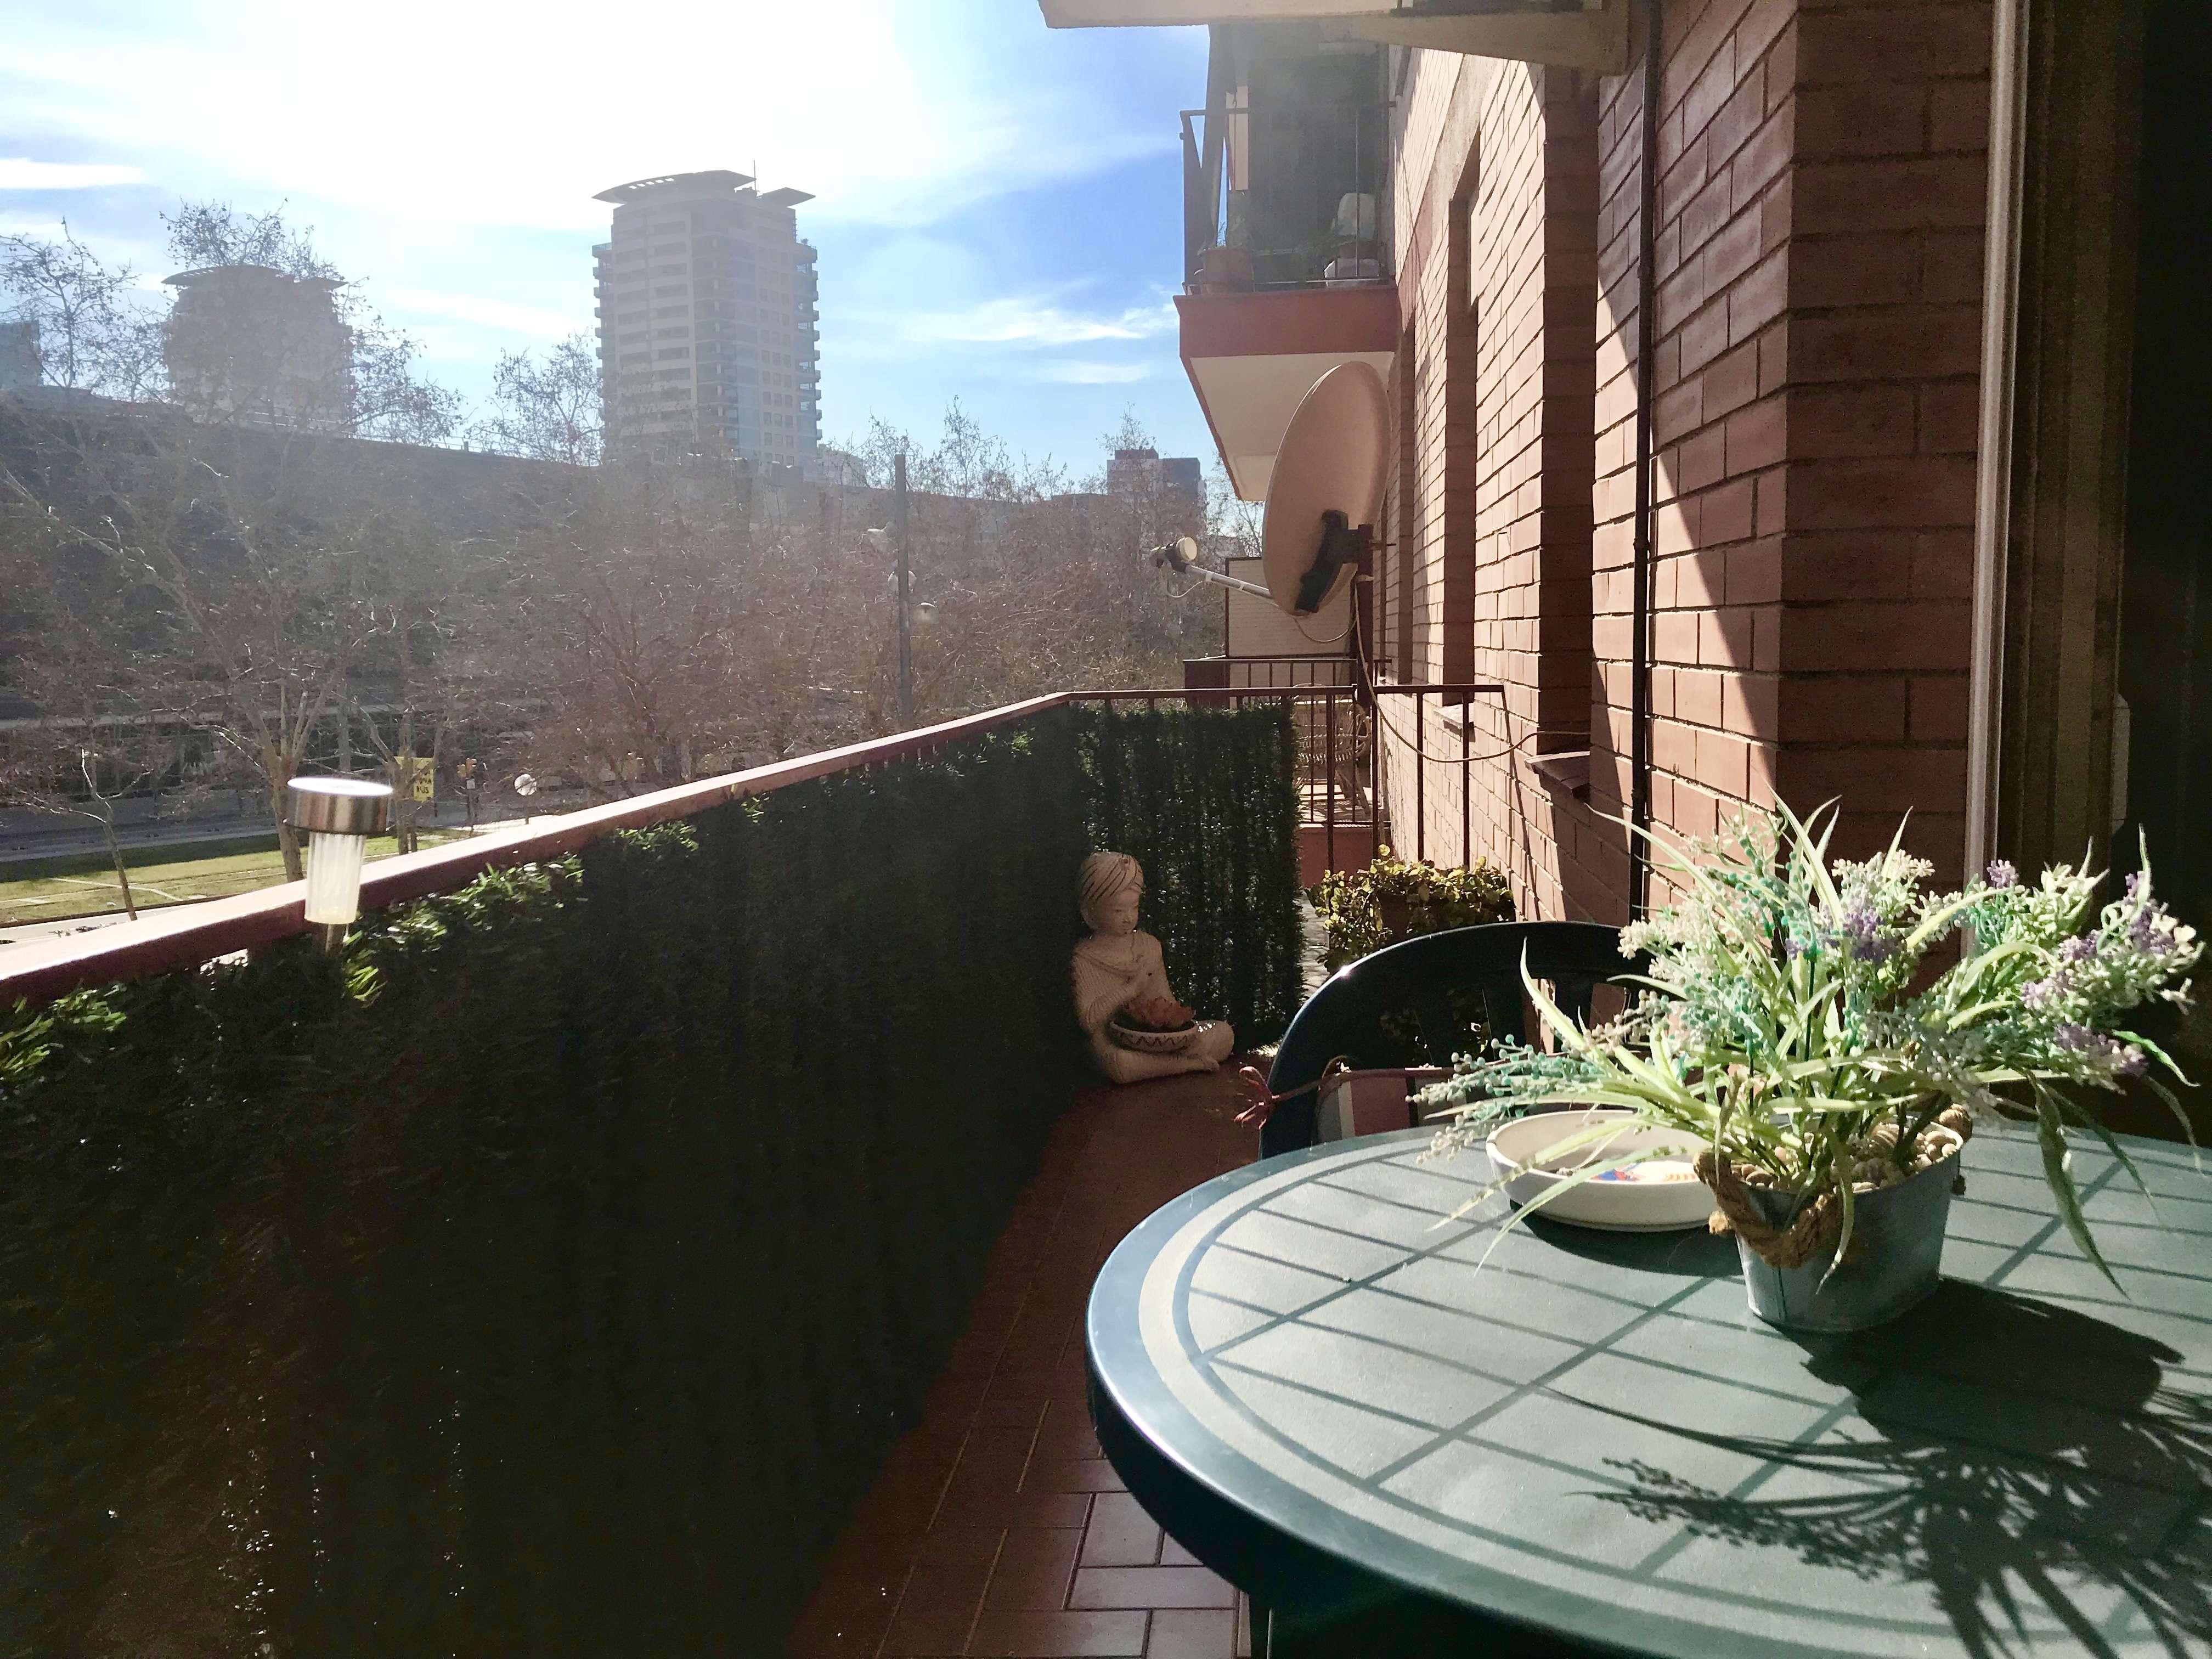 Квартира с террасой напротив ТЦ Диагональ Мар